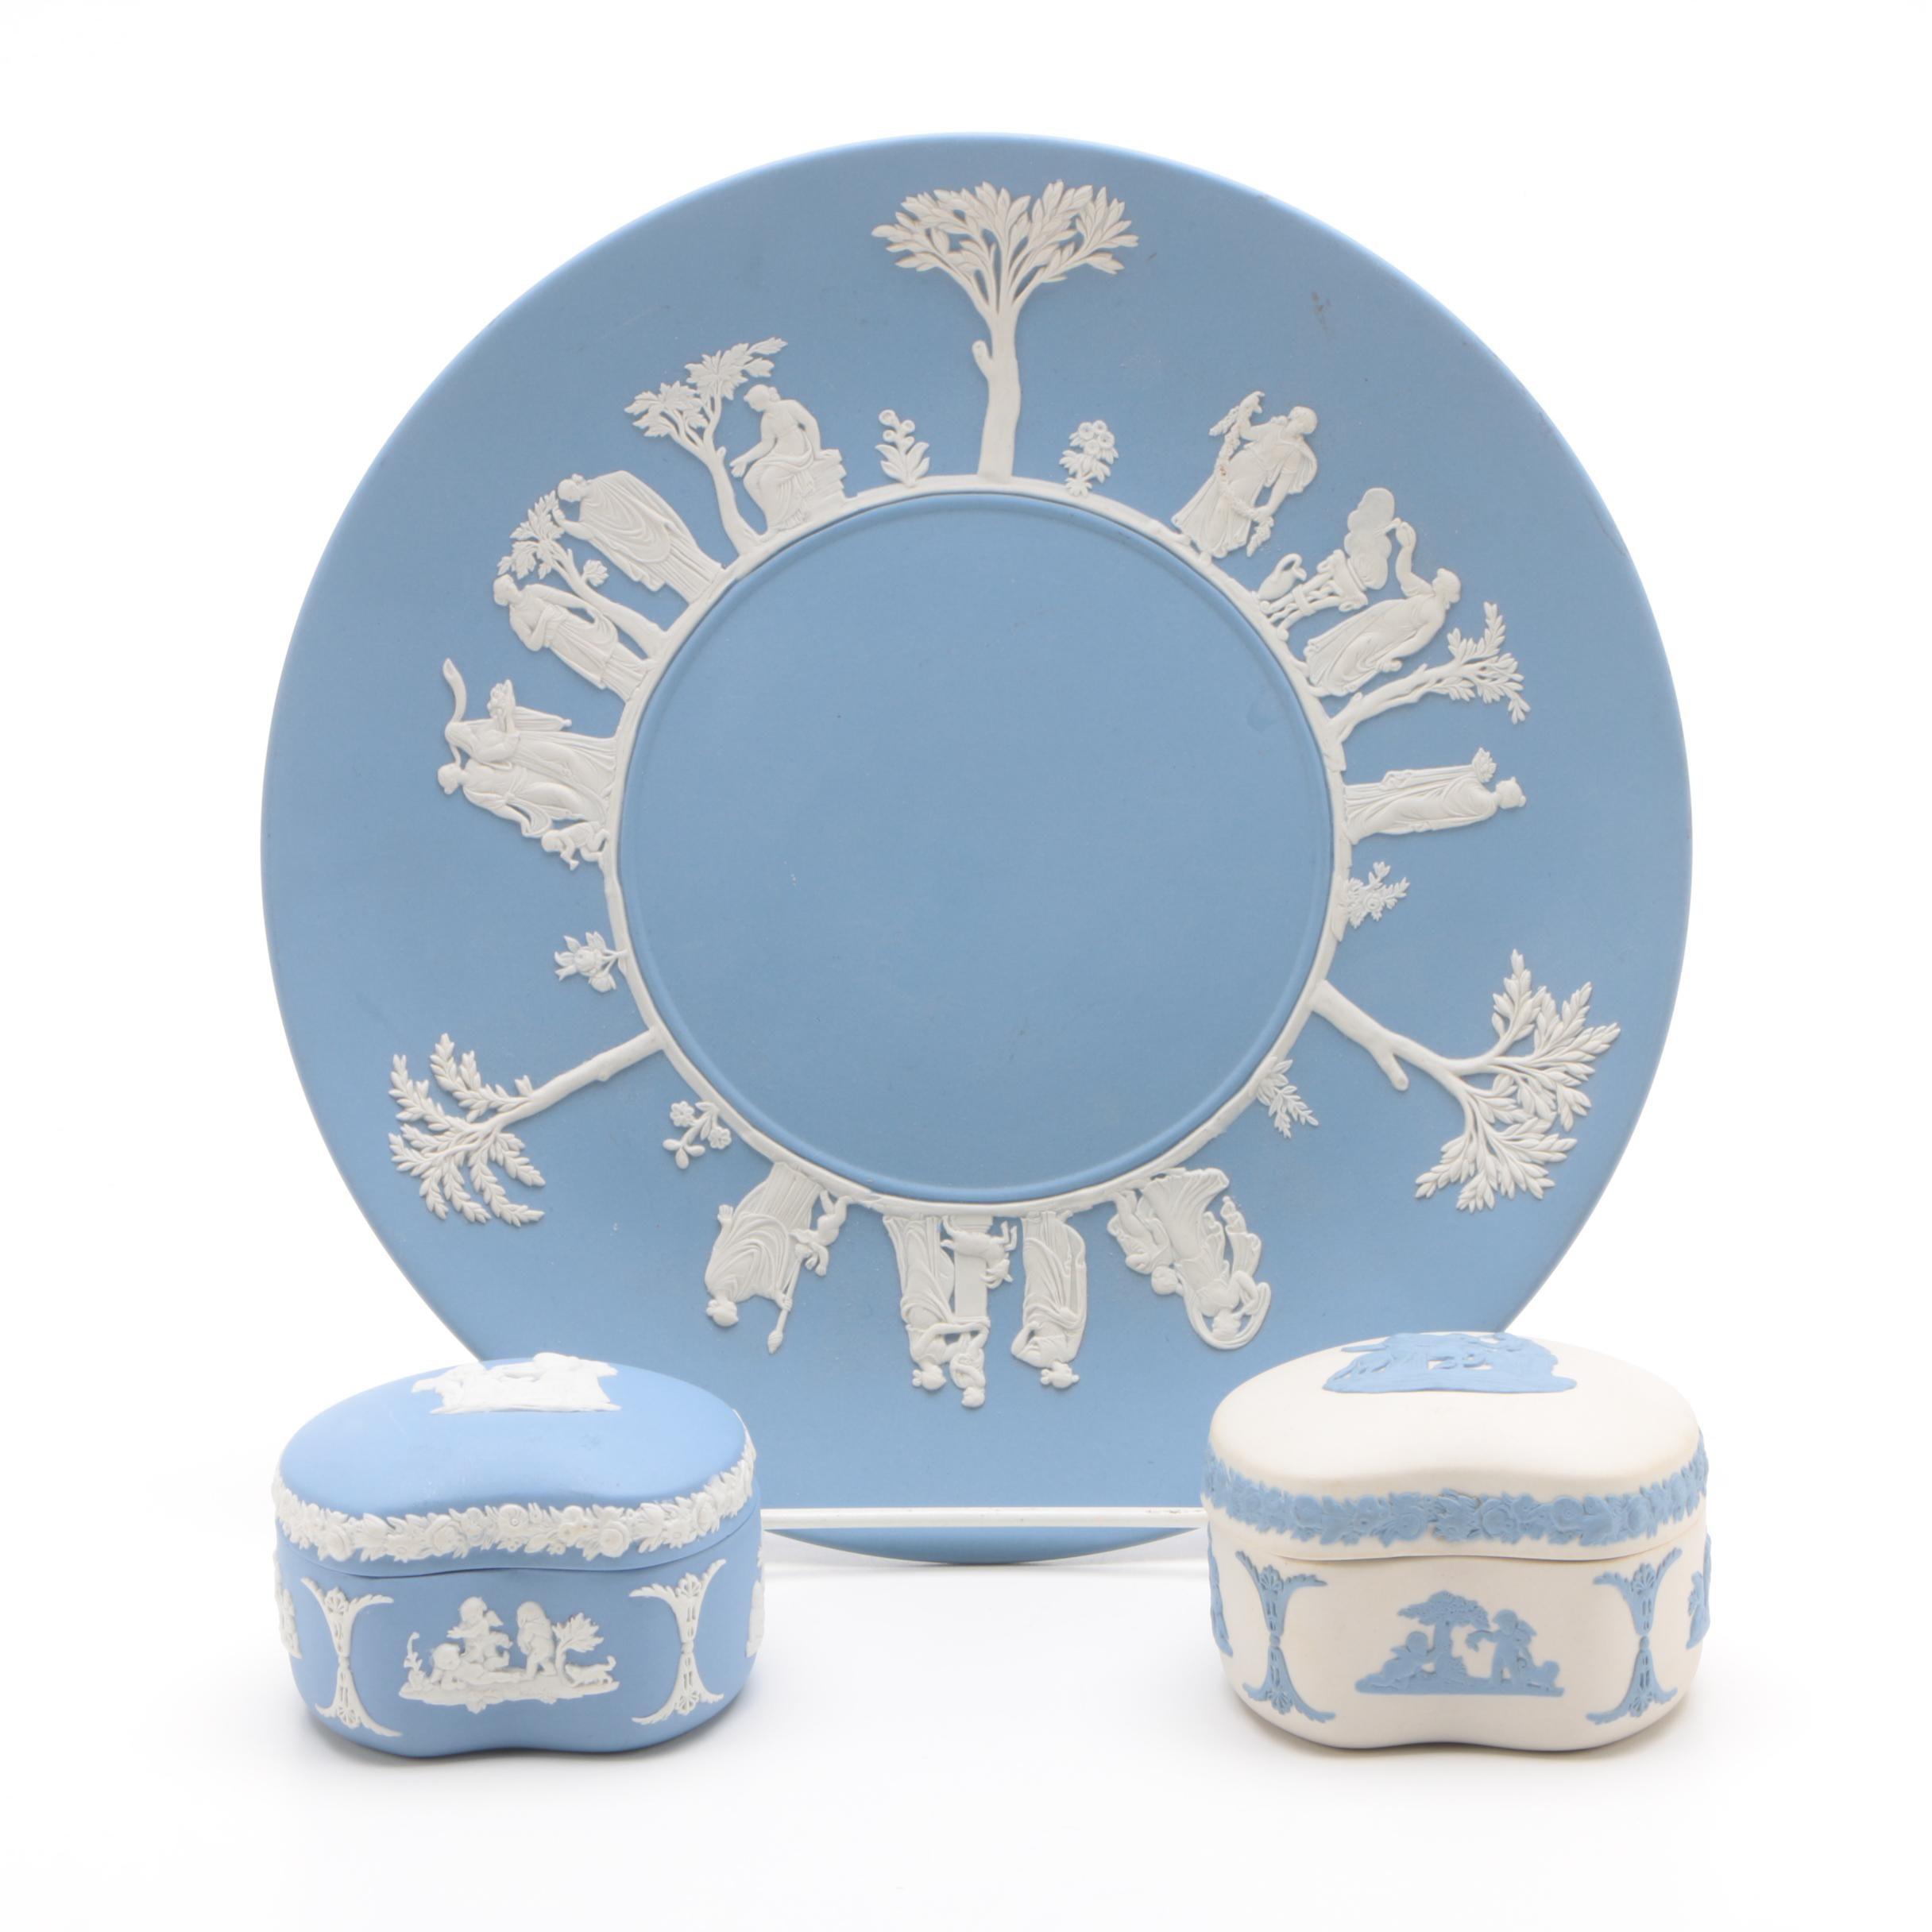 Wedgwood Jasperware Plate and Bean Boxes